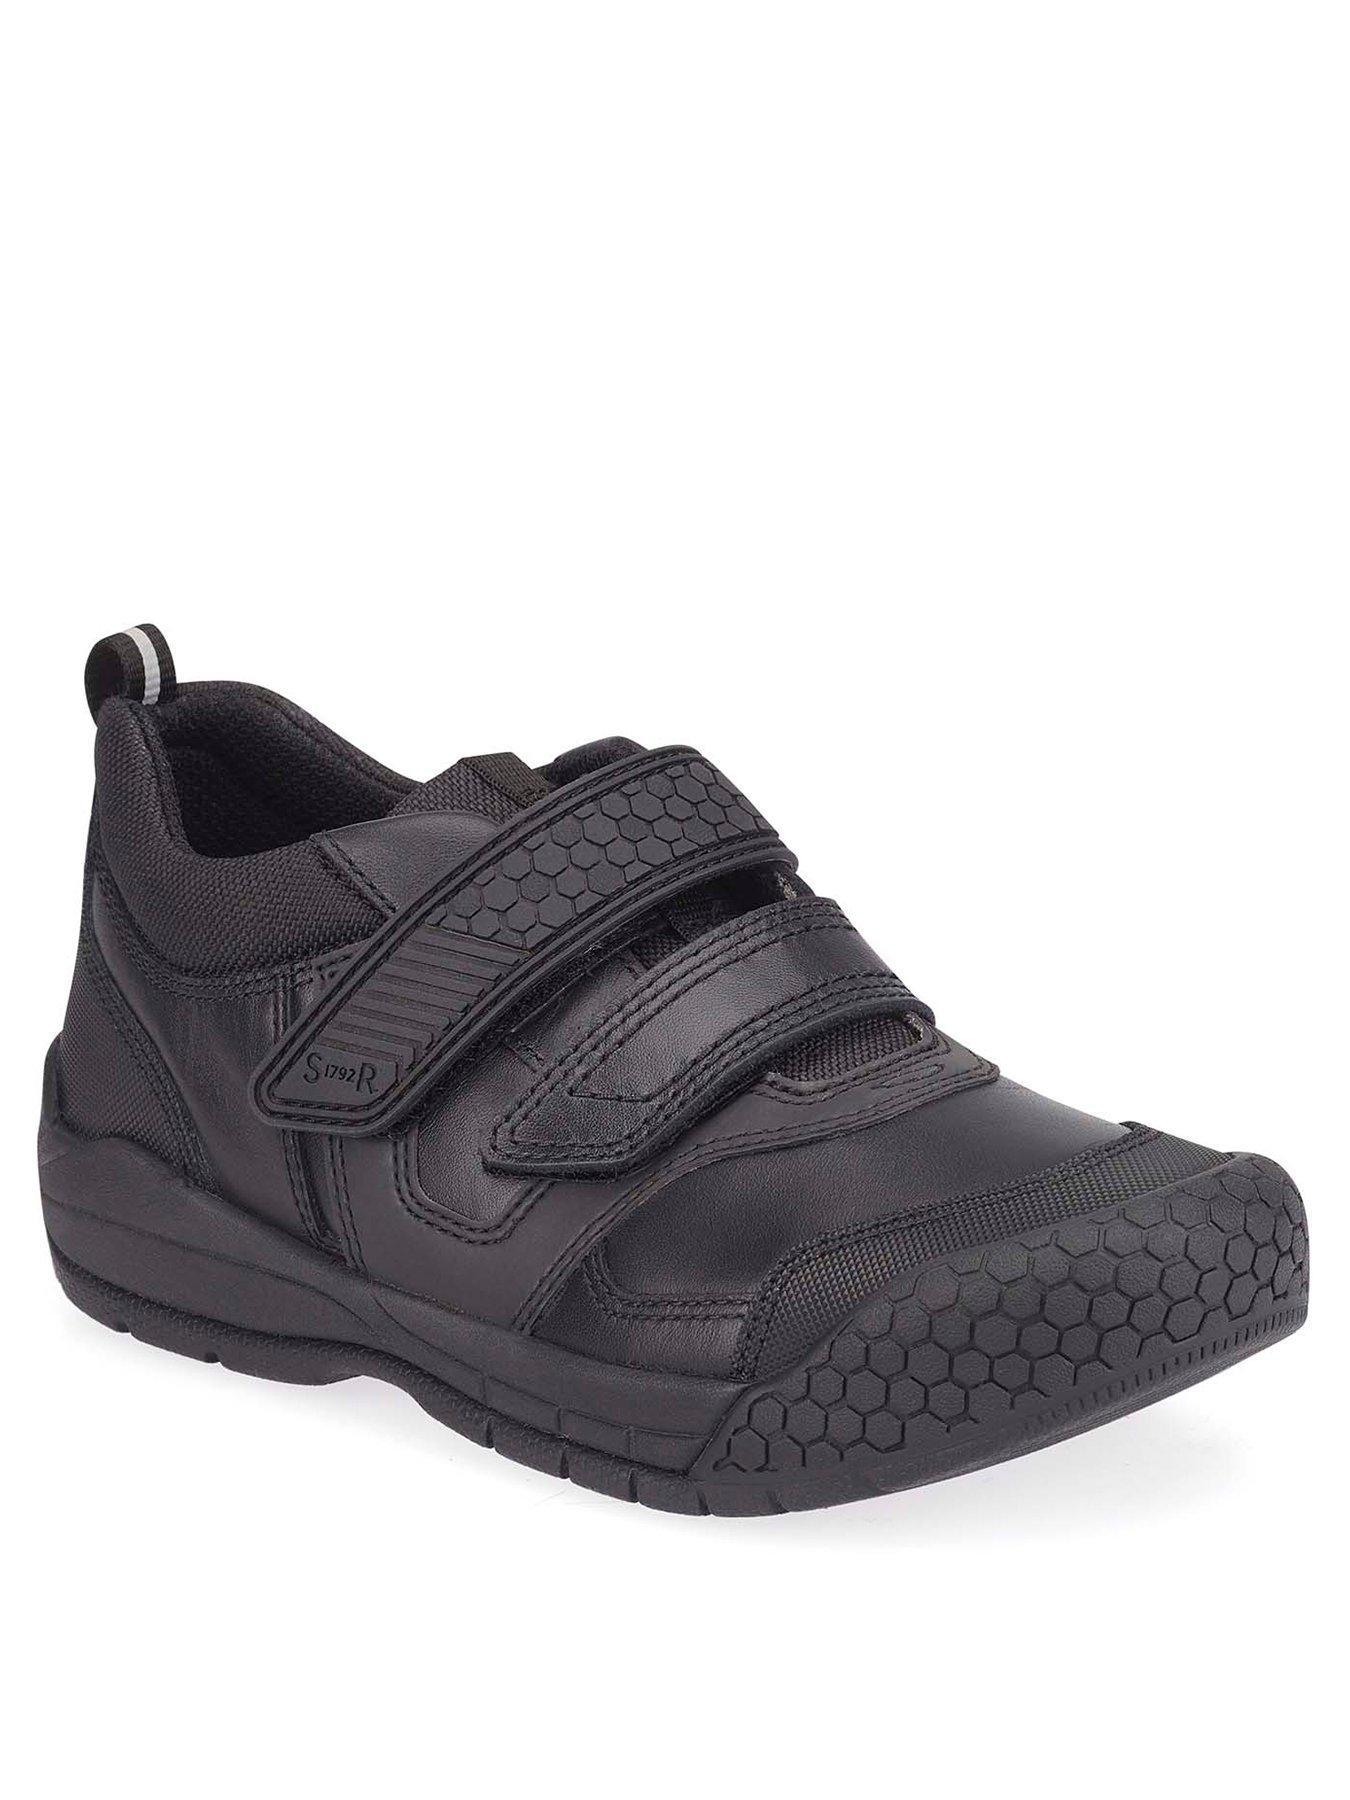 Venture Girls Start Rite Casual Shoes